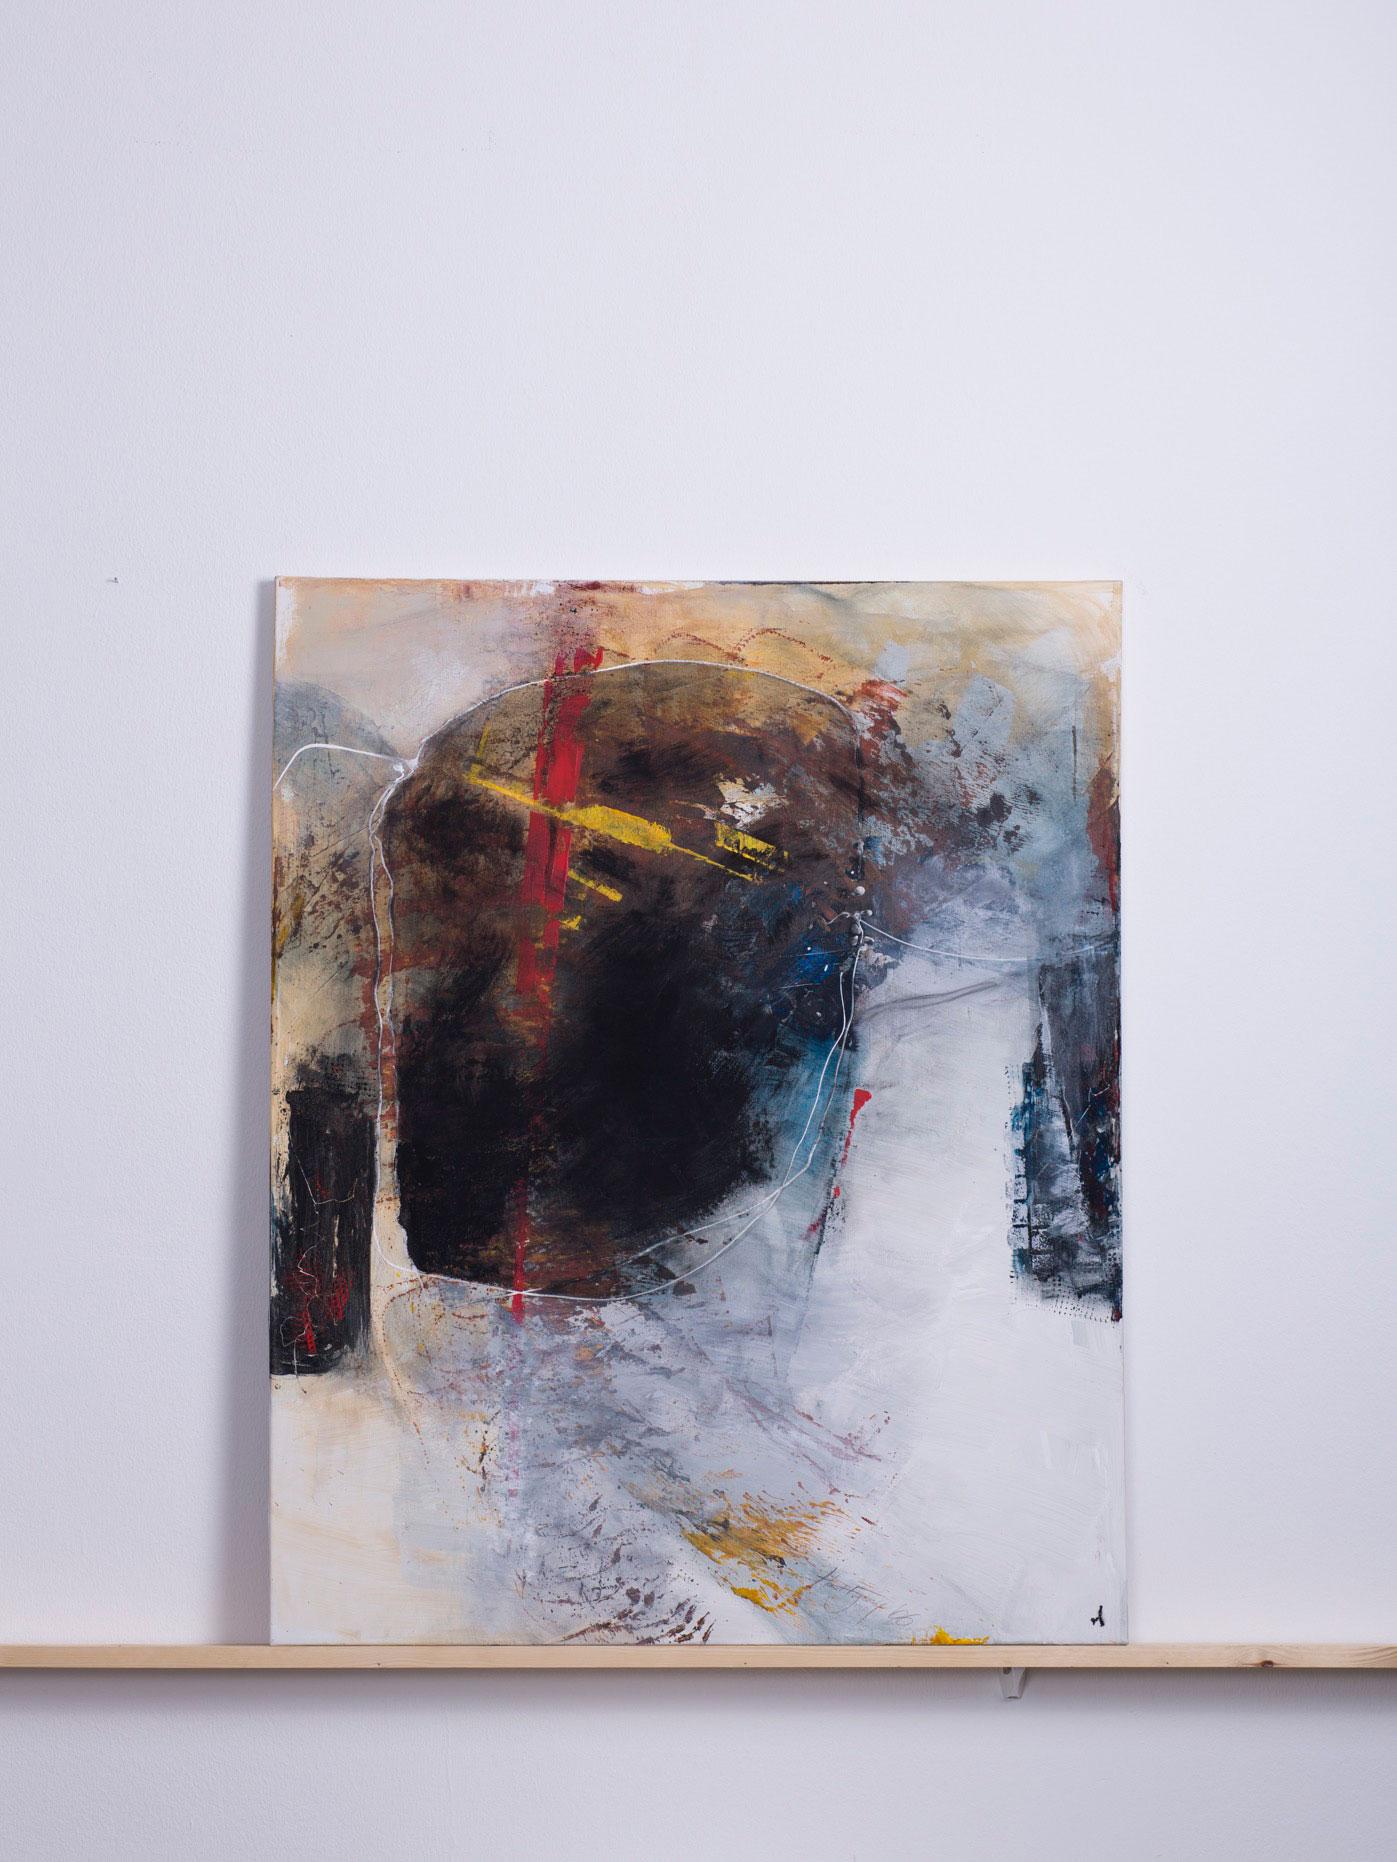 Noberatus, 2006 - 80x100 cm, <br>Acryl auf Leinwand